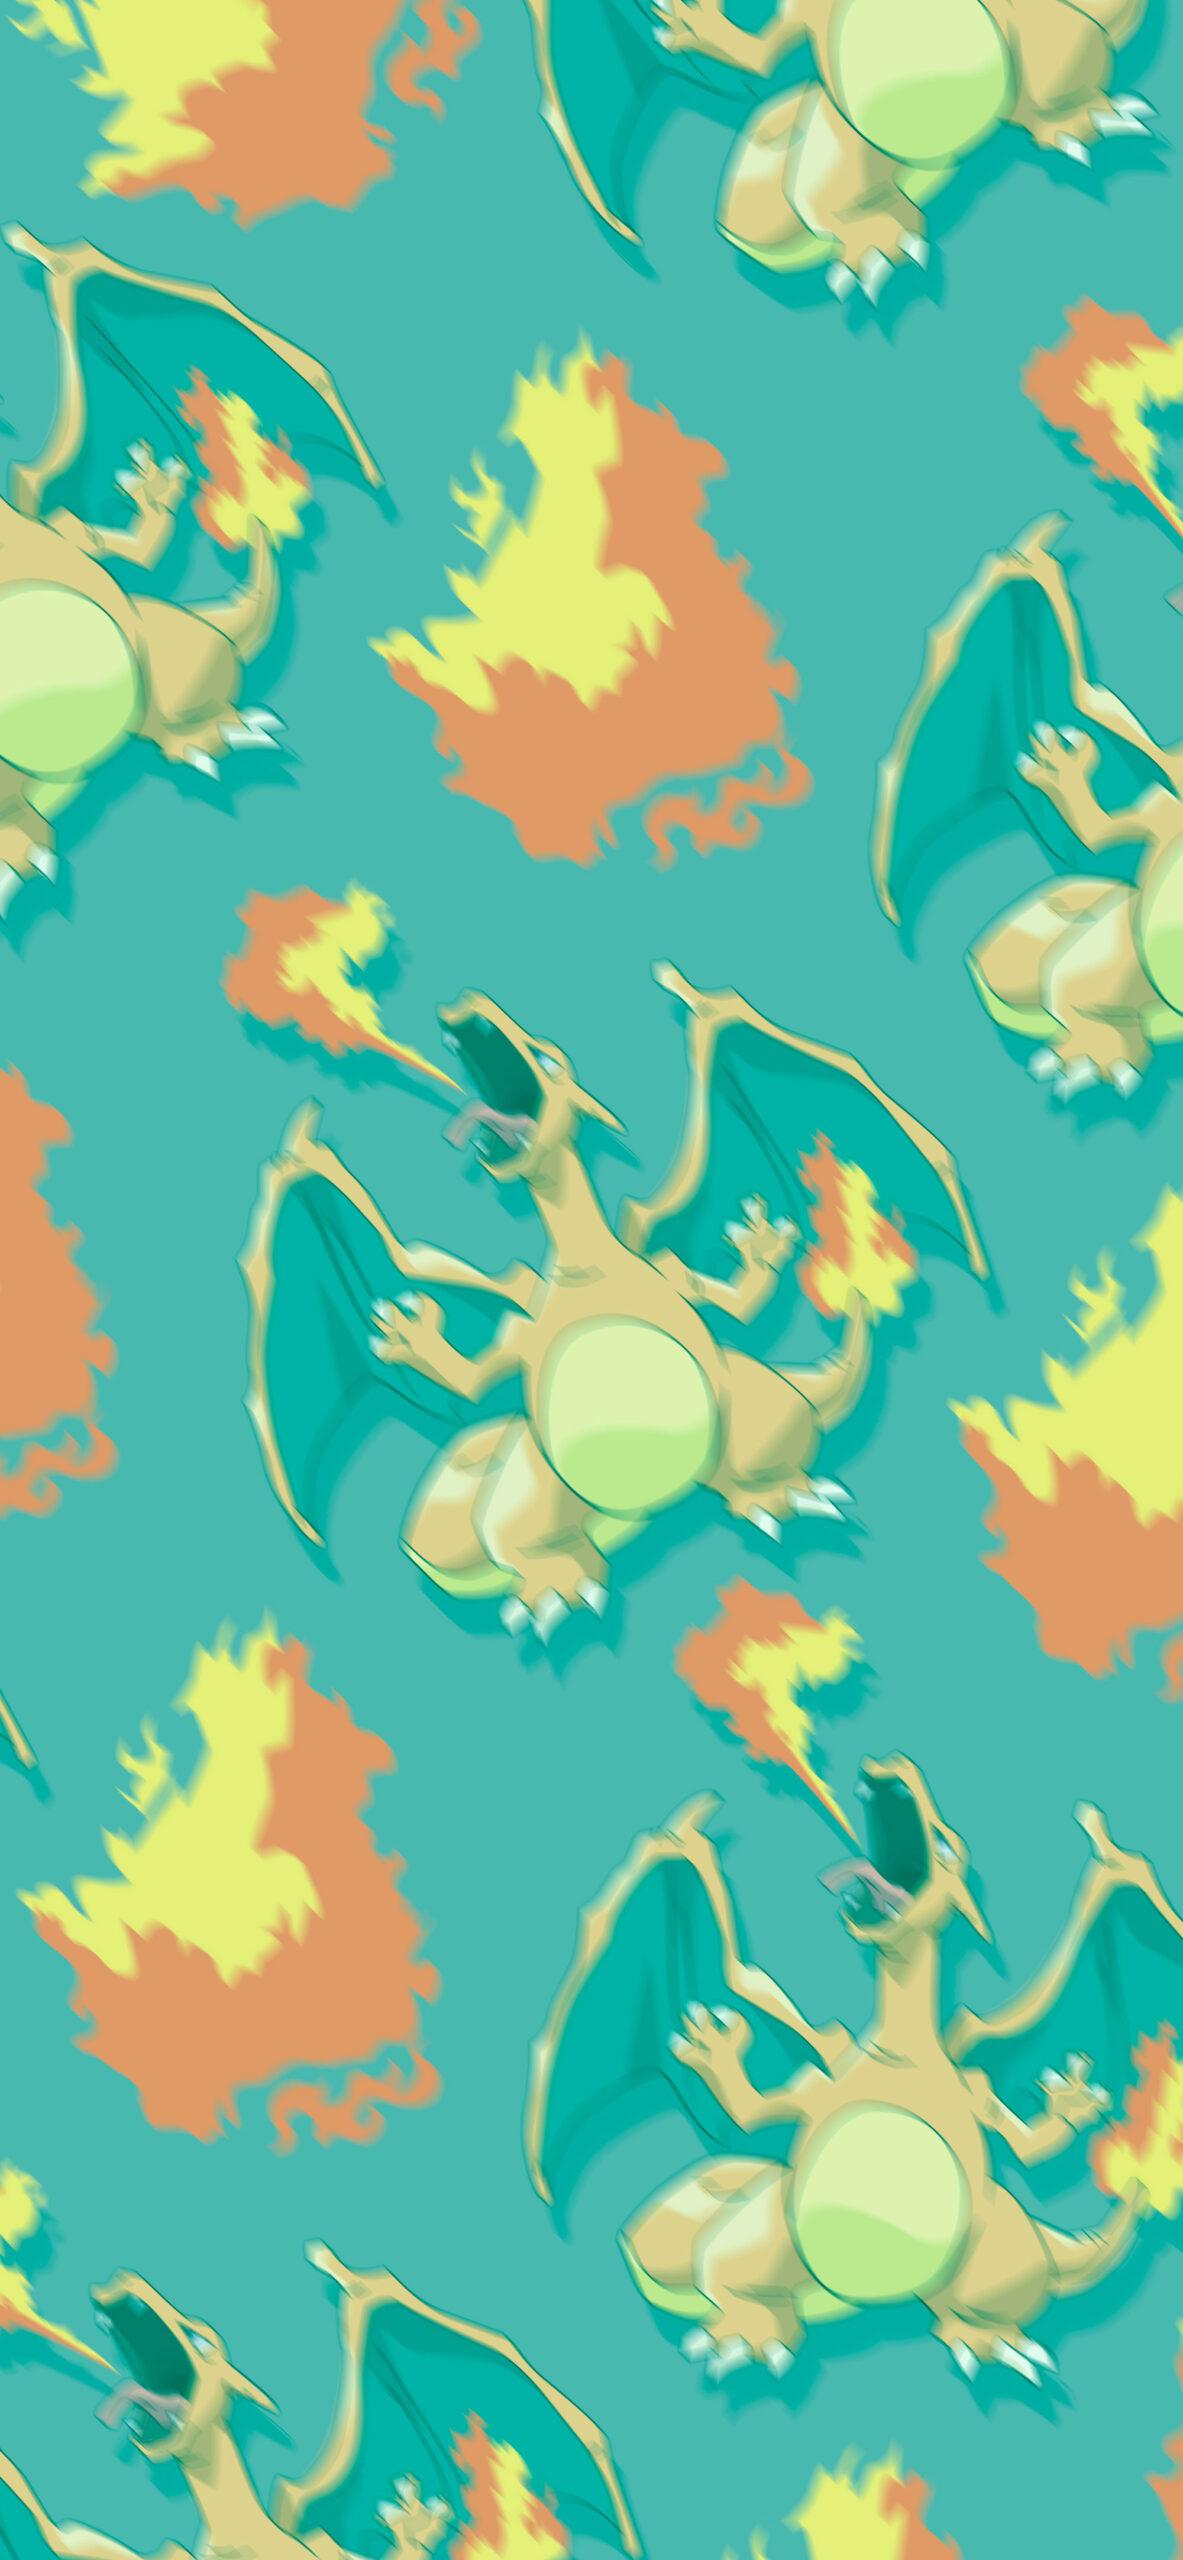 pokemon charizard green blur wallpaper